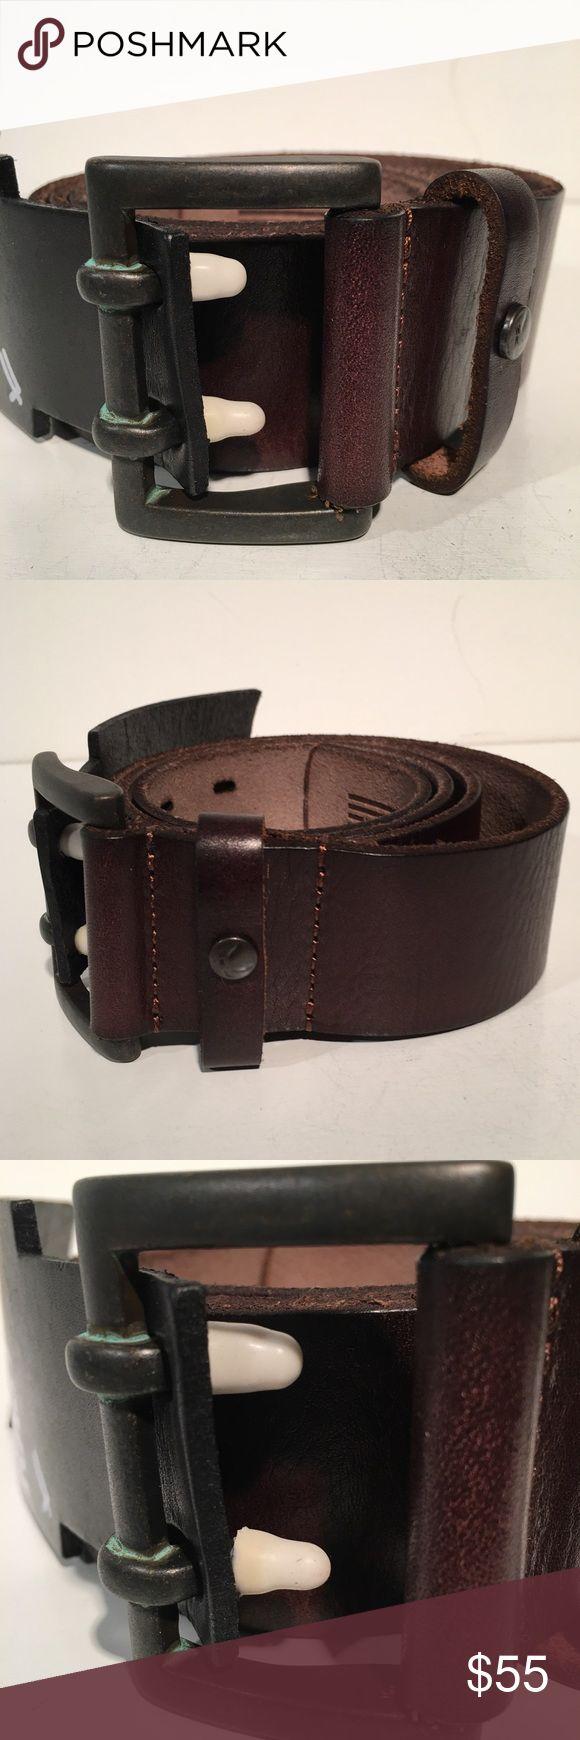 William Rast Brown Leather Belt Brand New William Rast Accessories Belts